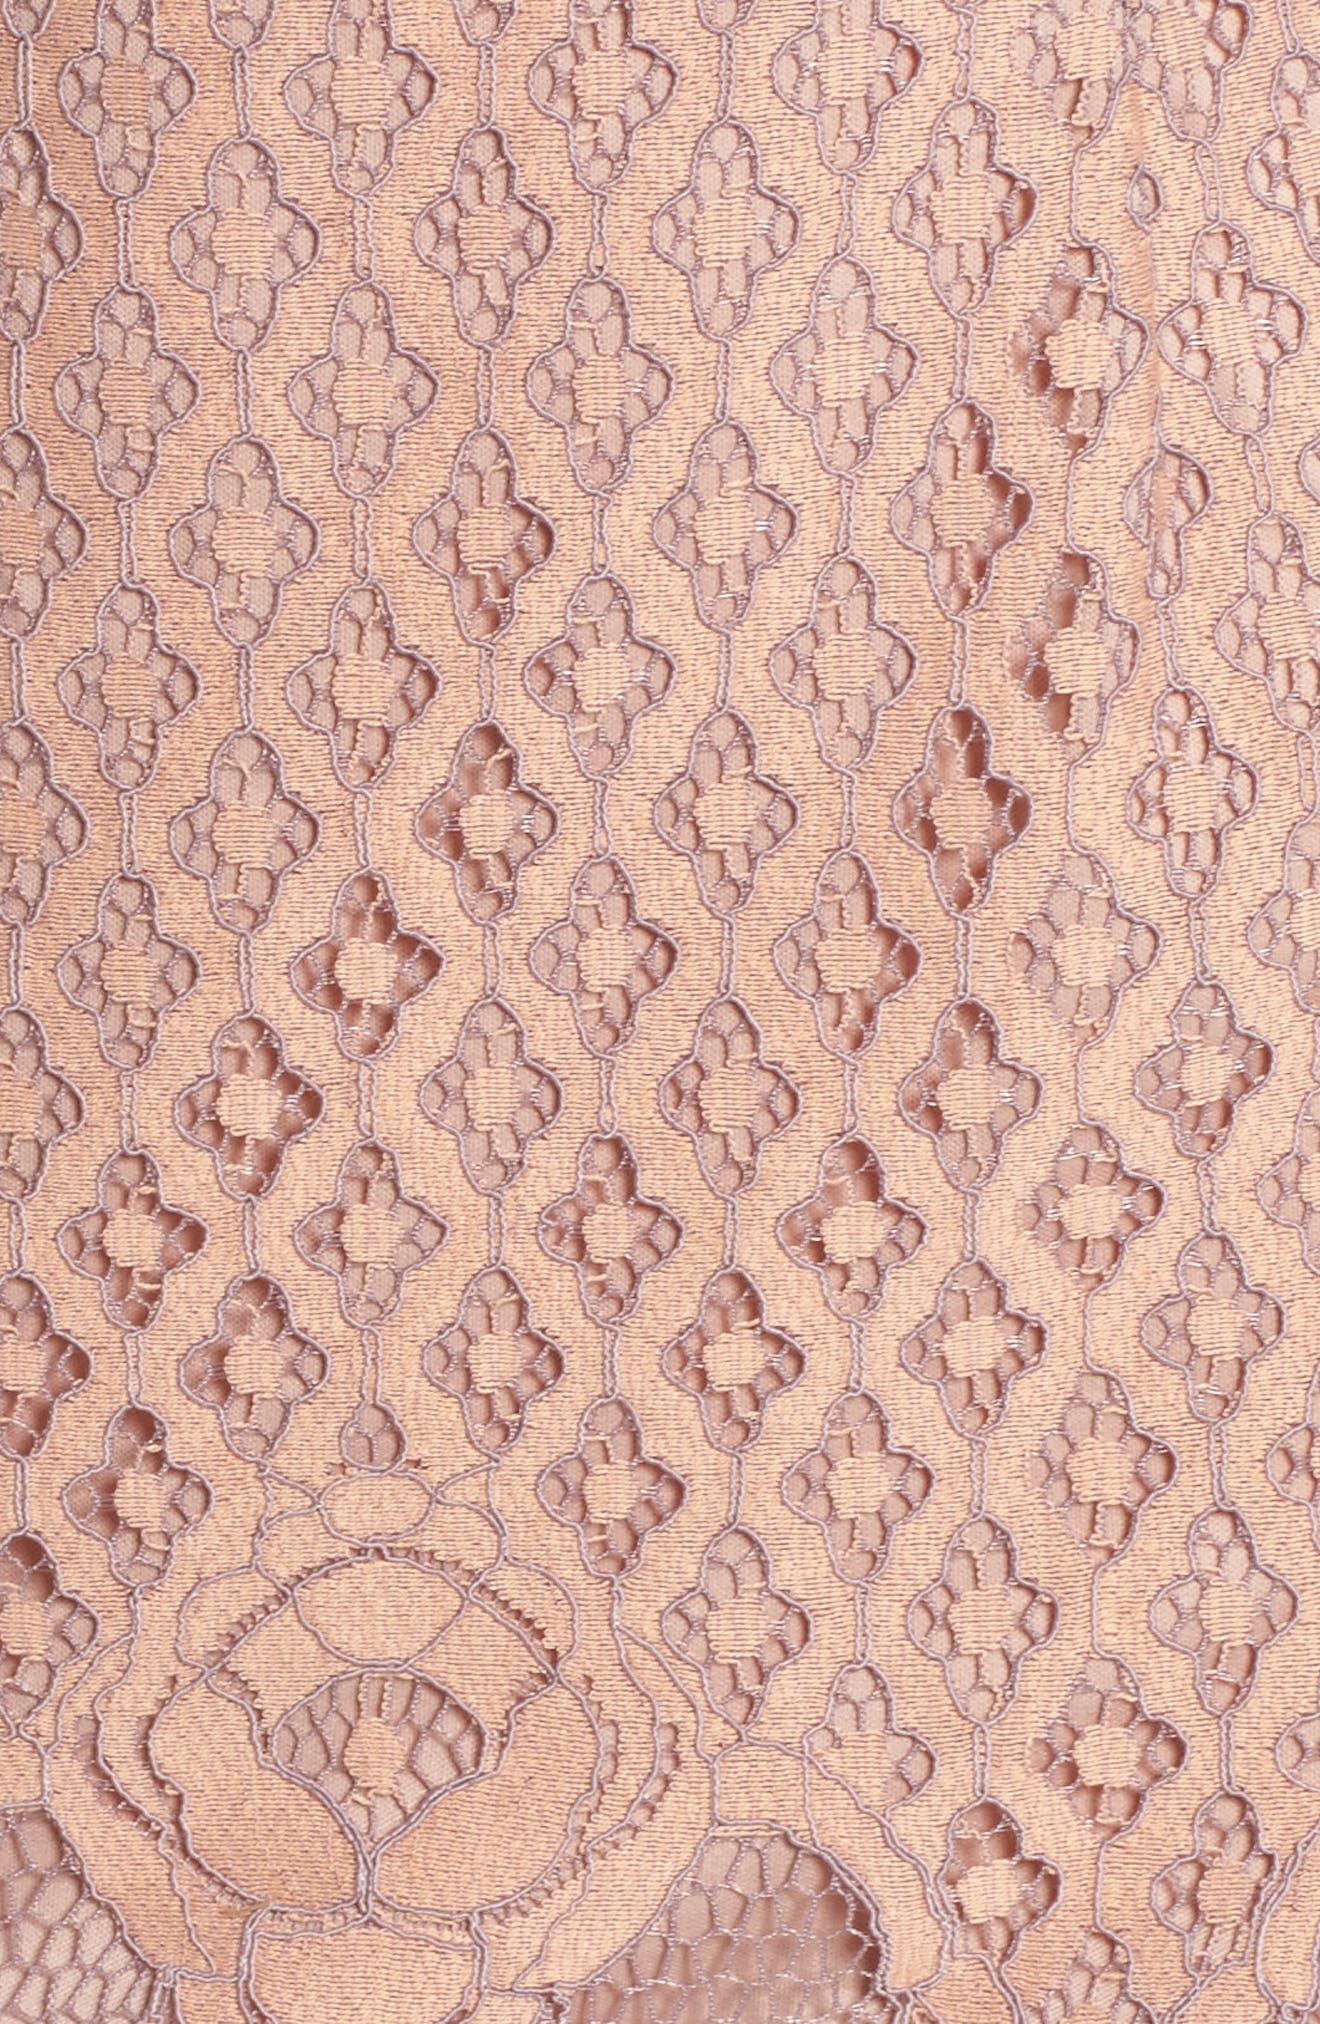 Lace Sheath Dress,                             Alternate thumbnail 5, color,                             950